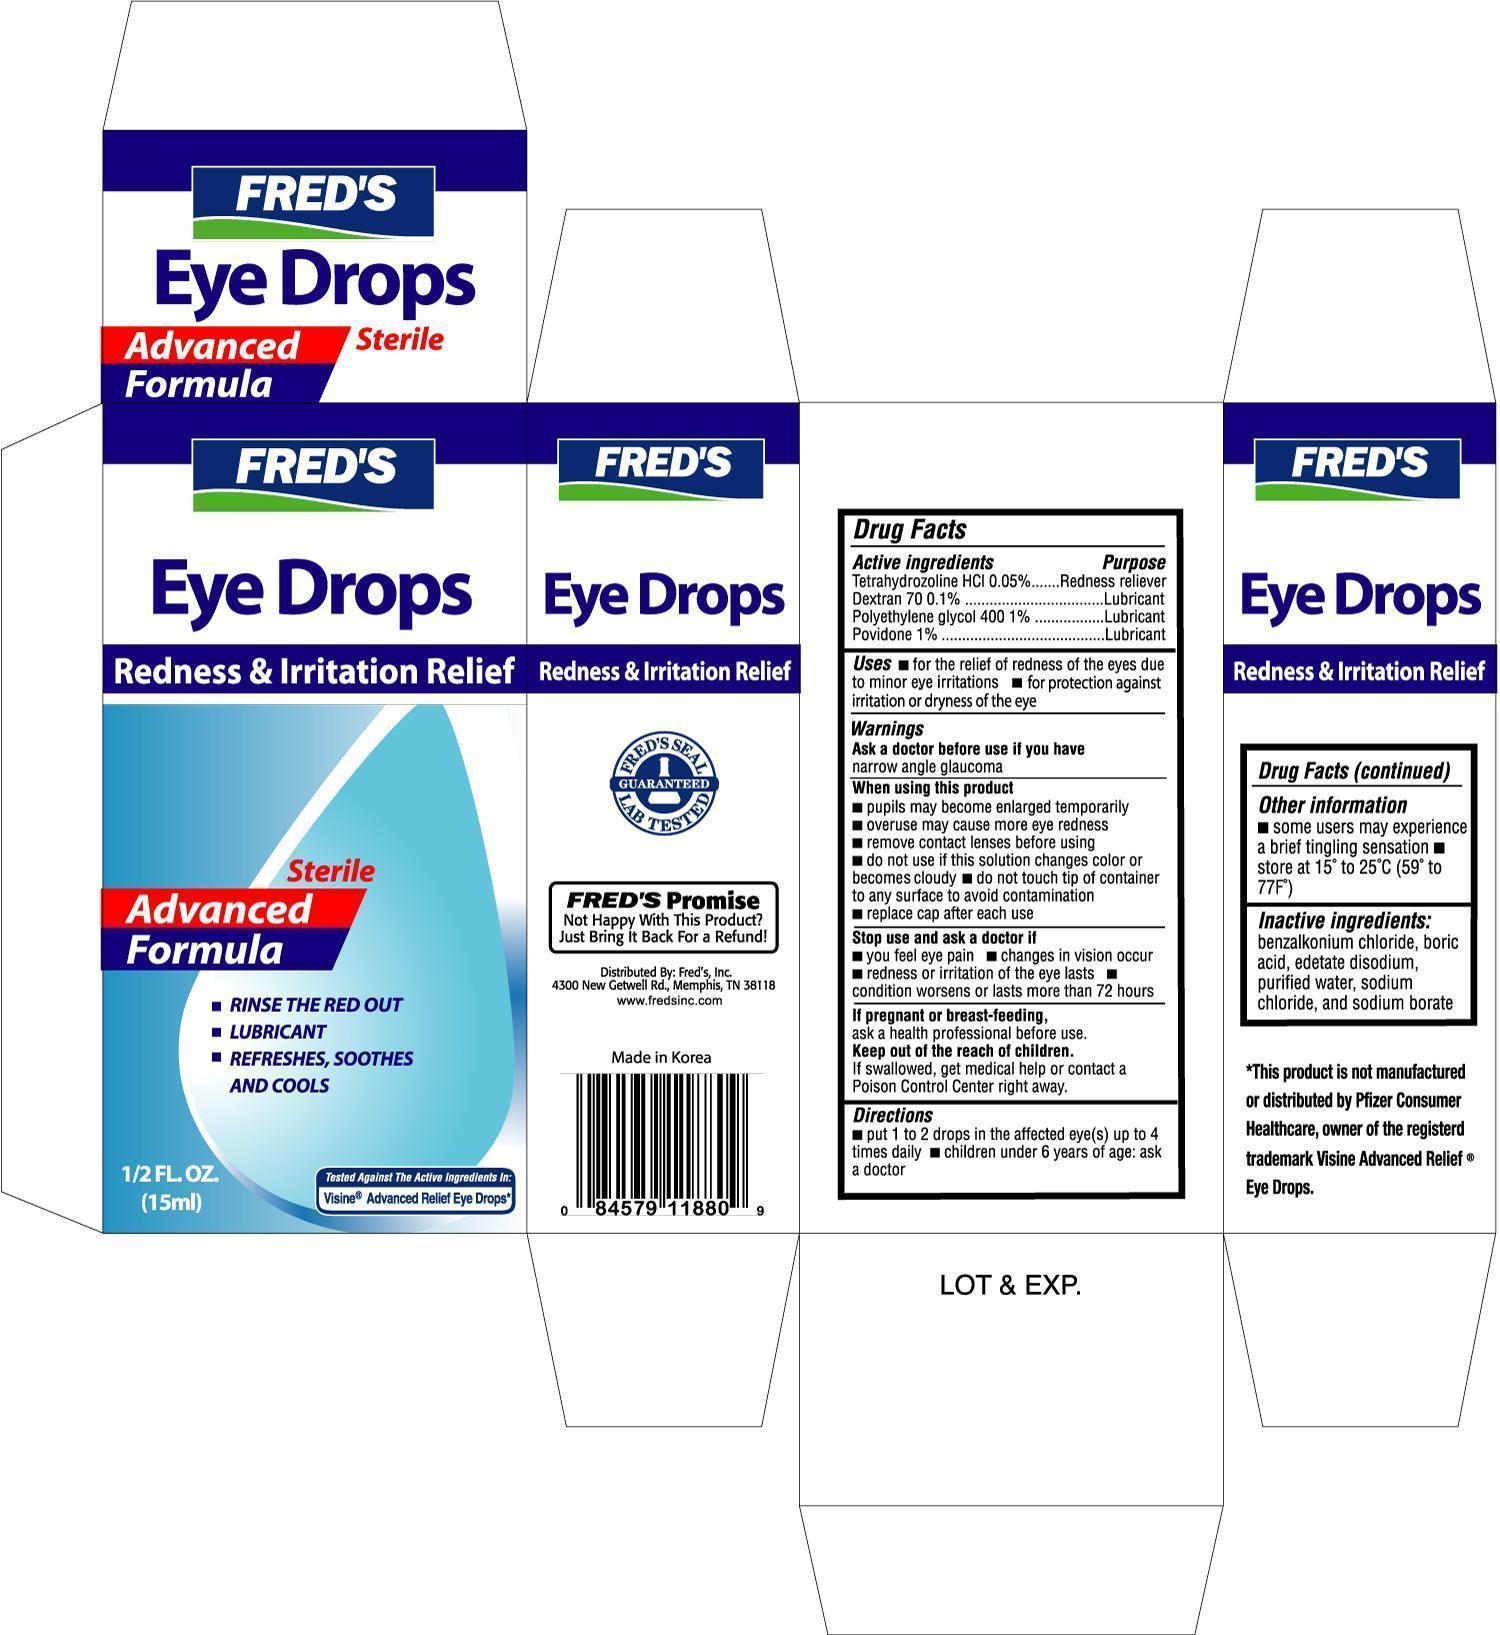 Freds Advanced Eye Drops (Dextran 70, Polyethylene Glycol 400, Povidone, Tetrahydrozoline Hcl) Solution [Freds, Inc]